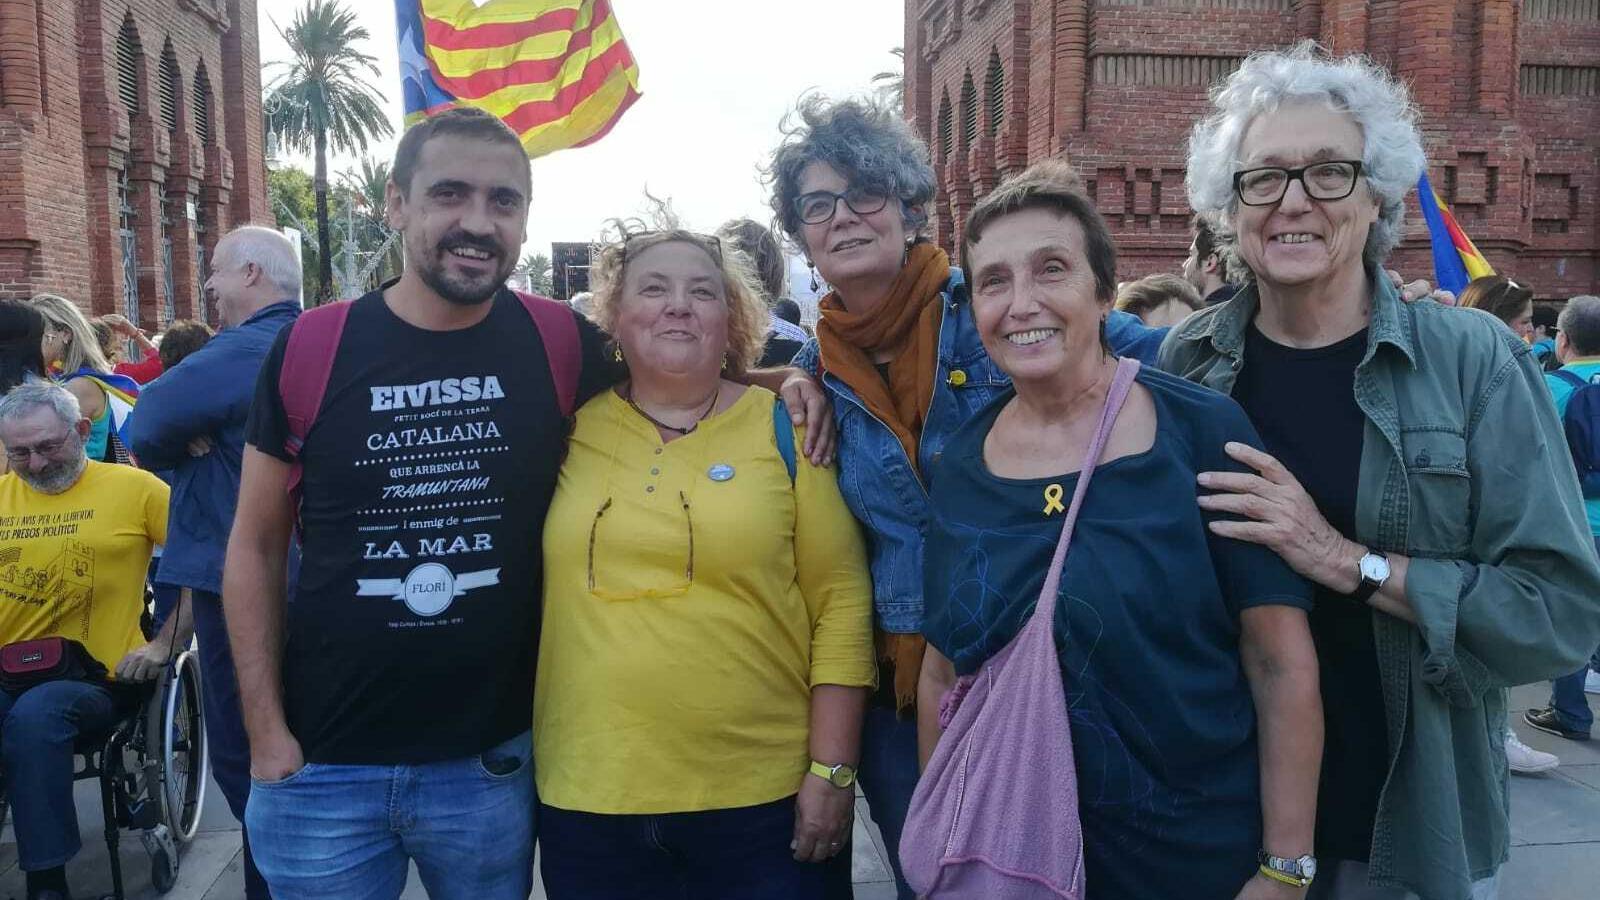 La directora de Política Lingüística davant l'Arc de Triomf de Barcelona.